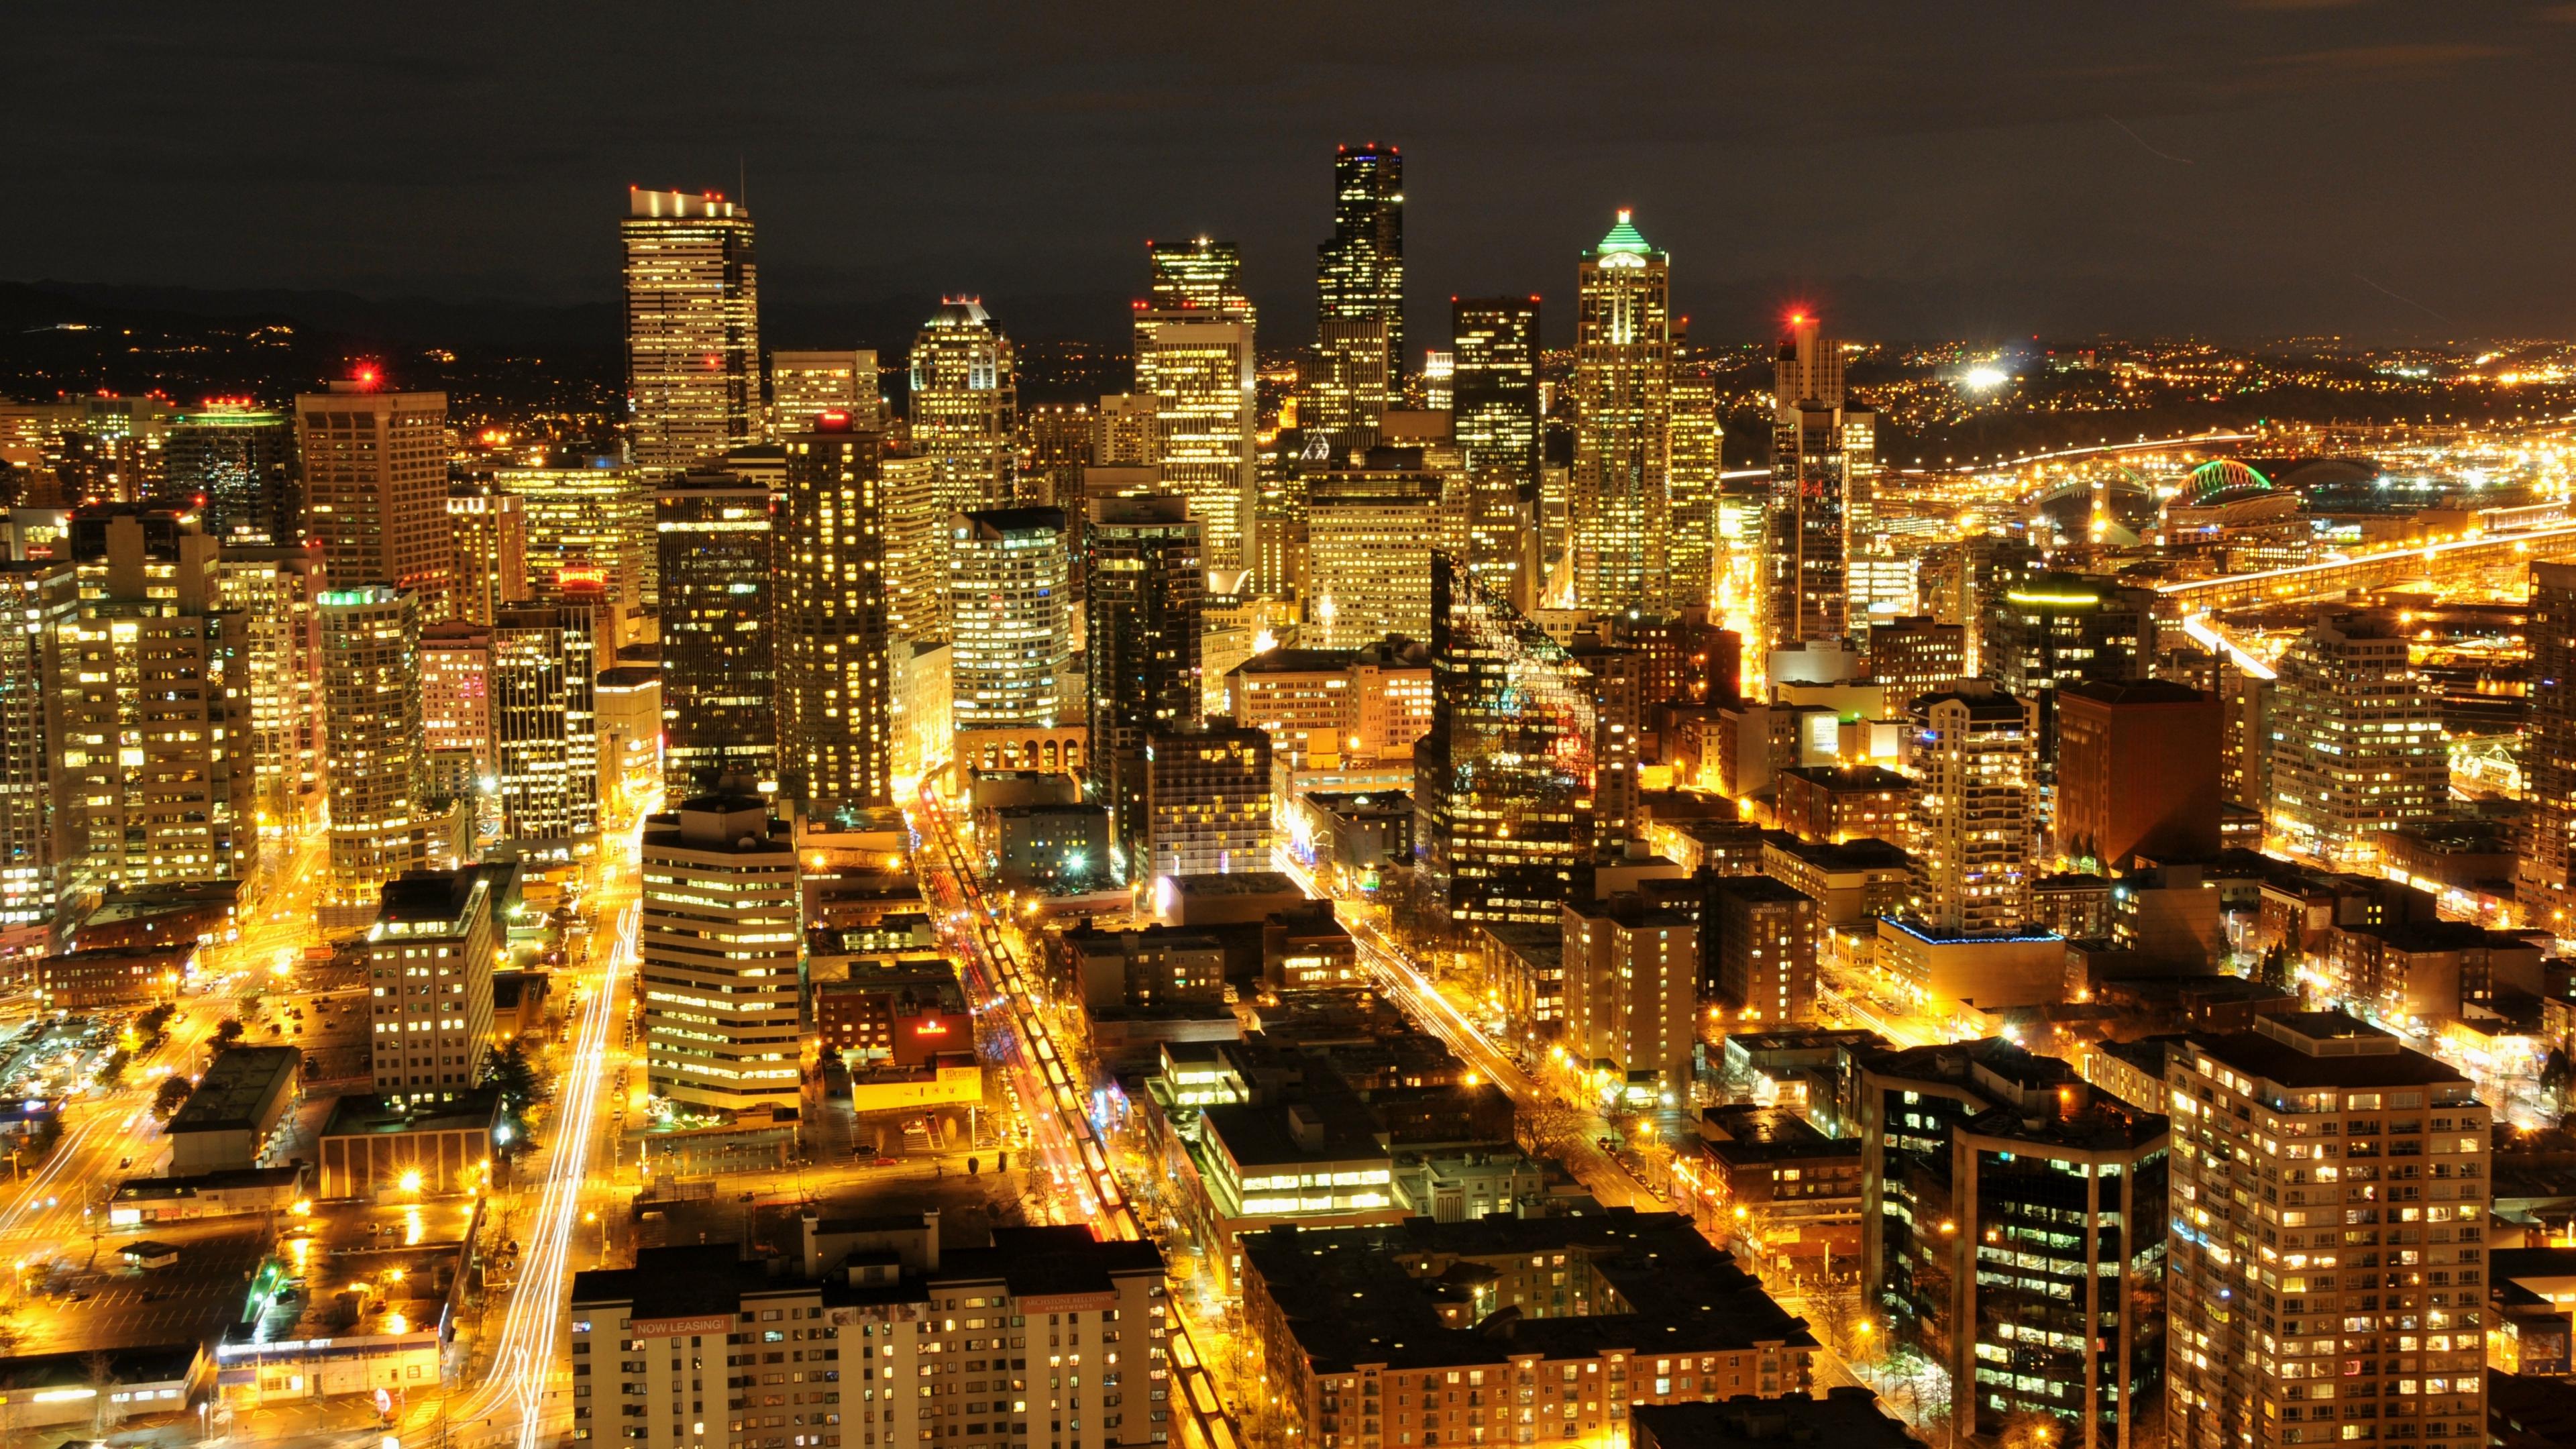 usa washington seattle night city skyscrapers buildings lights 4k 1538068057 - usa, washington, seattle, night city, skyscrapers, buildings, lights 4k - Washington, USA, Seattle